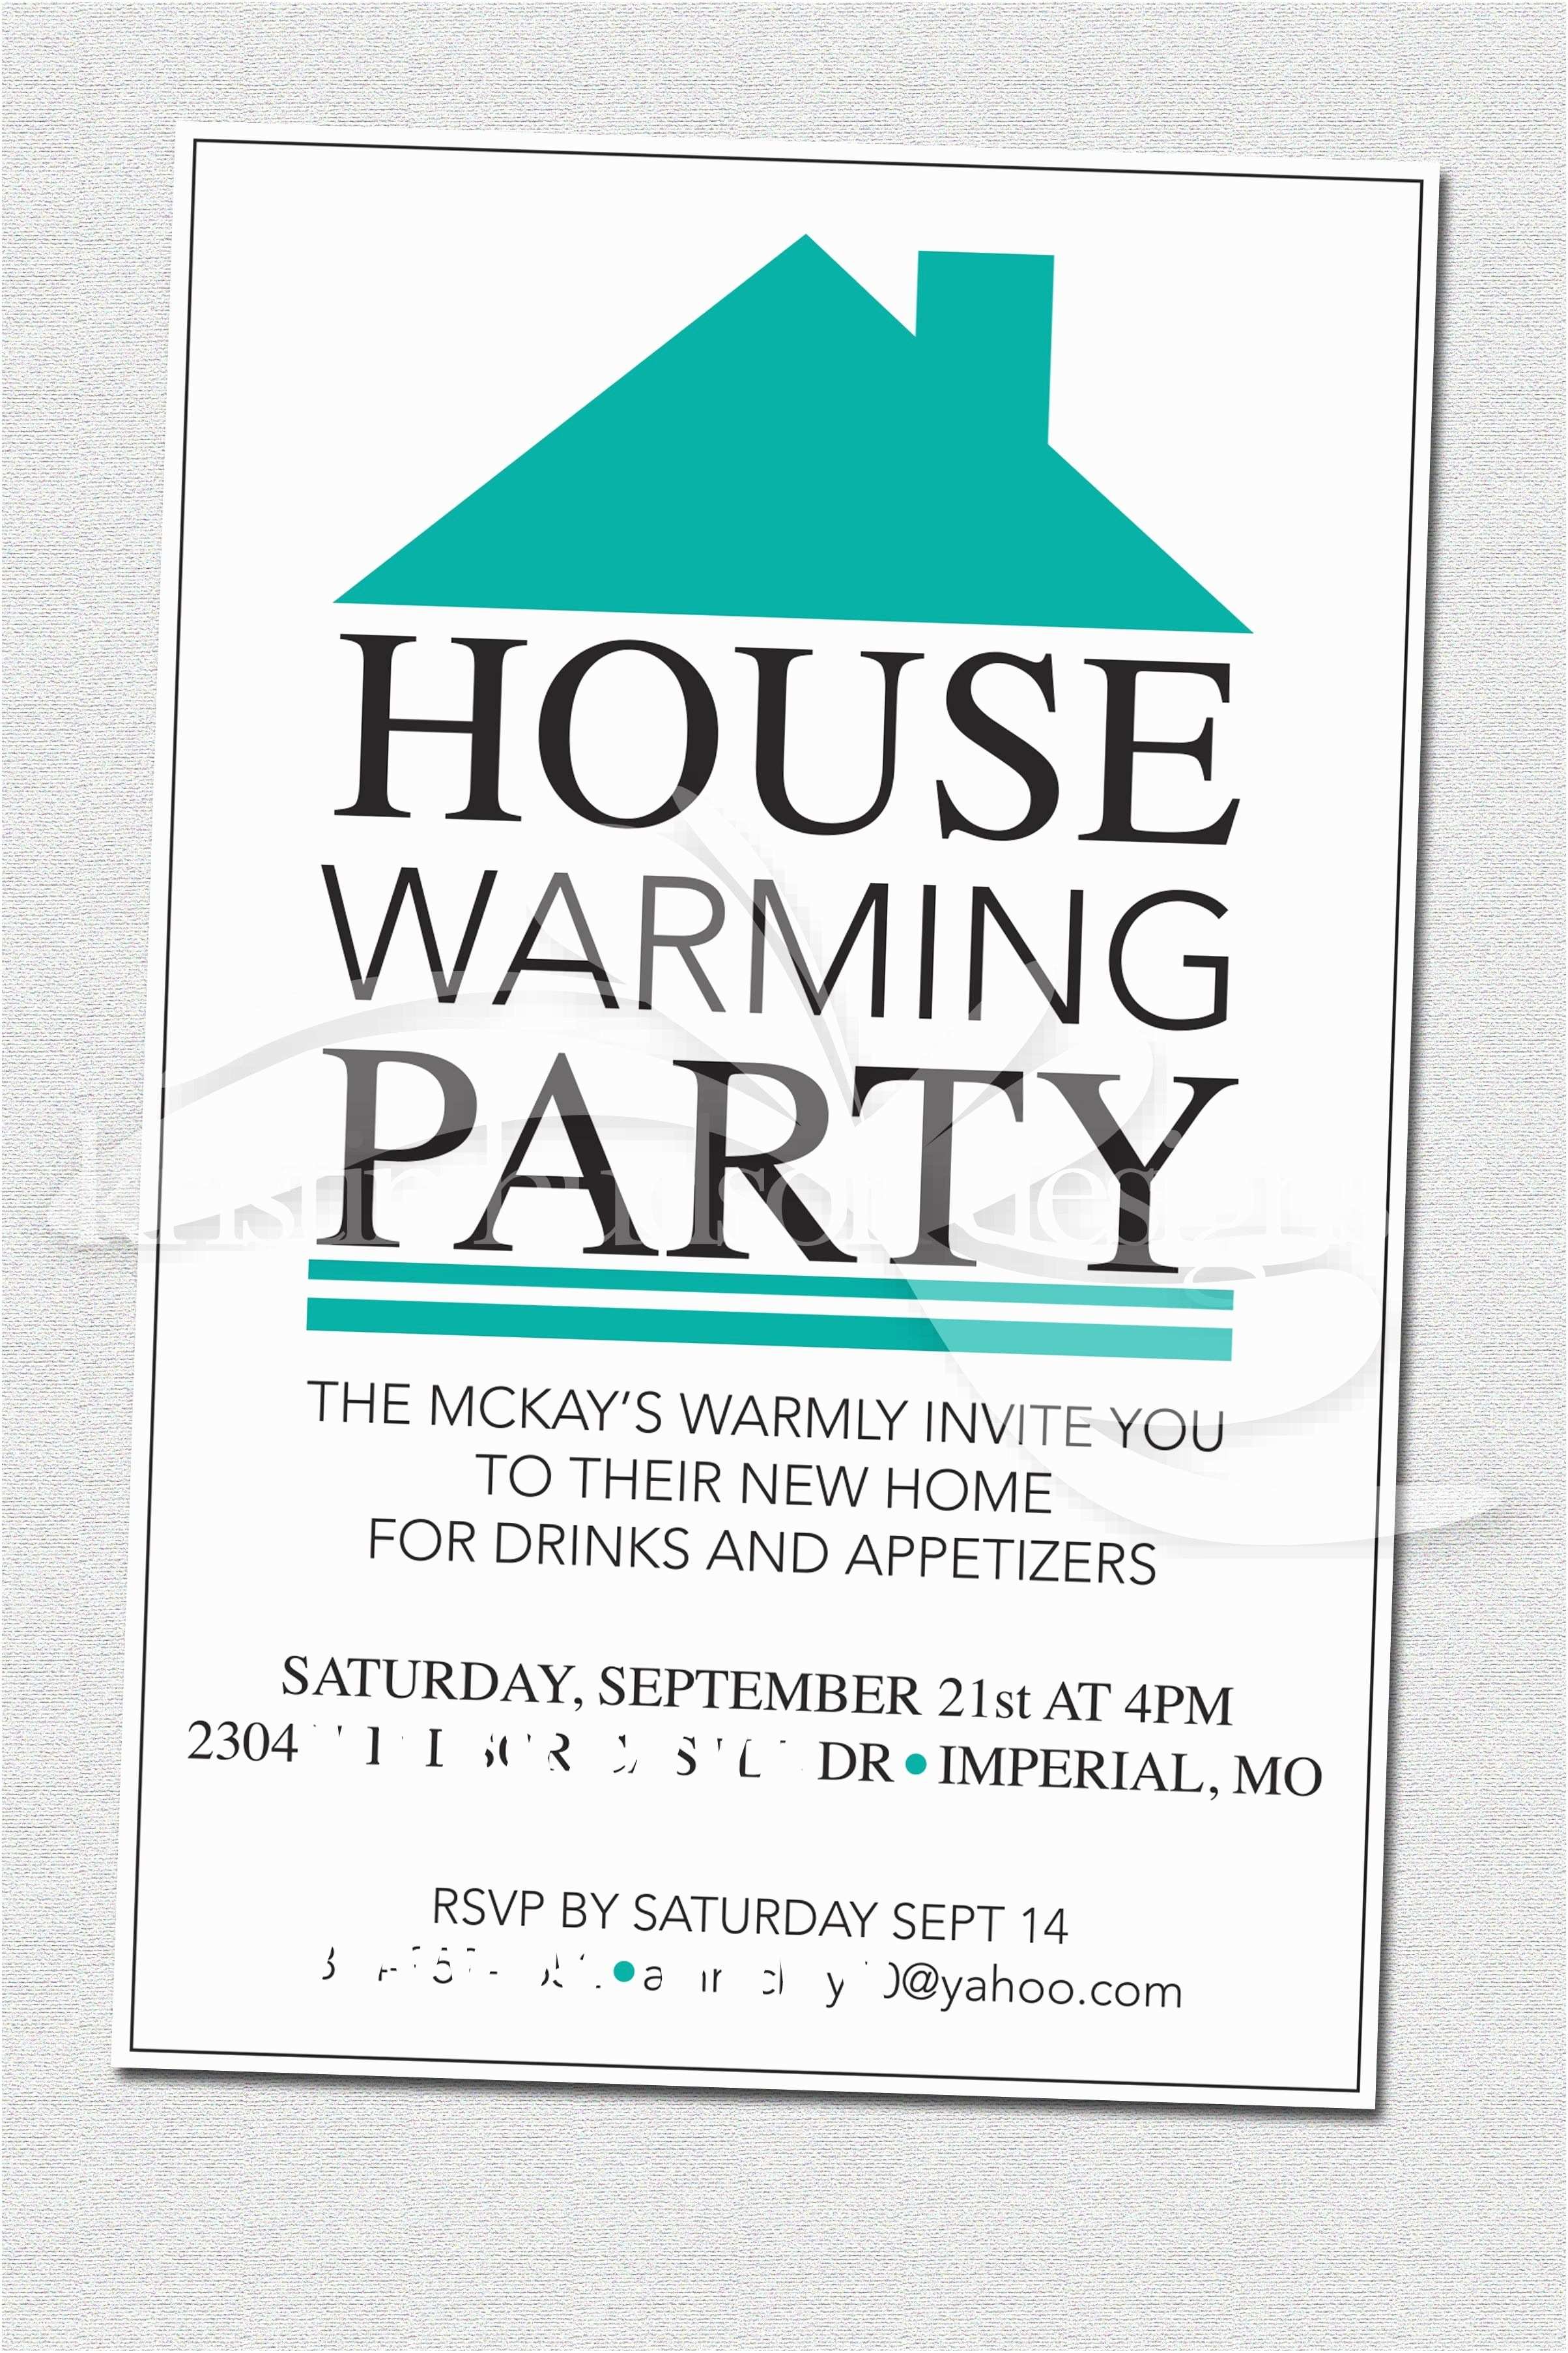 /housewarming/housewarming Invitation Wording House Warming Party Invite